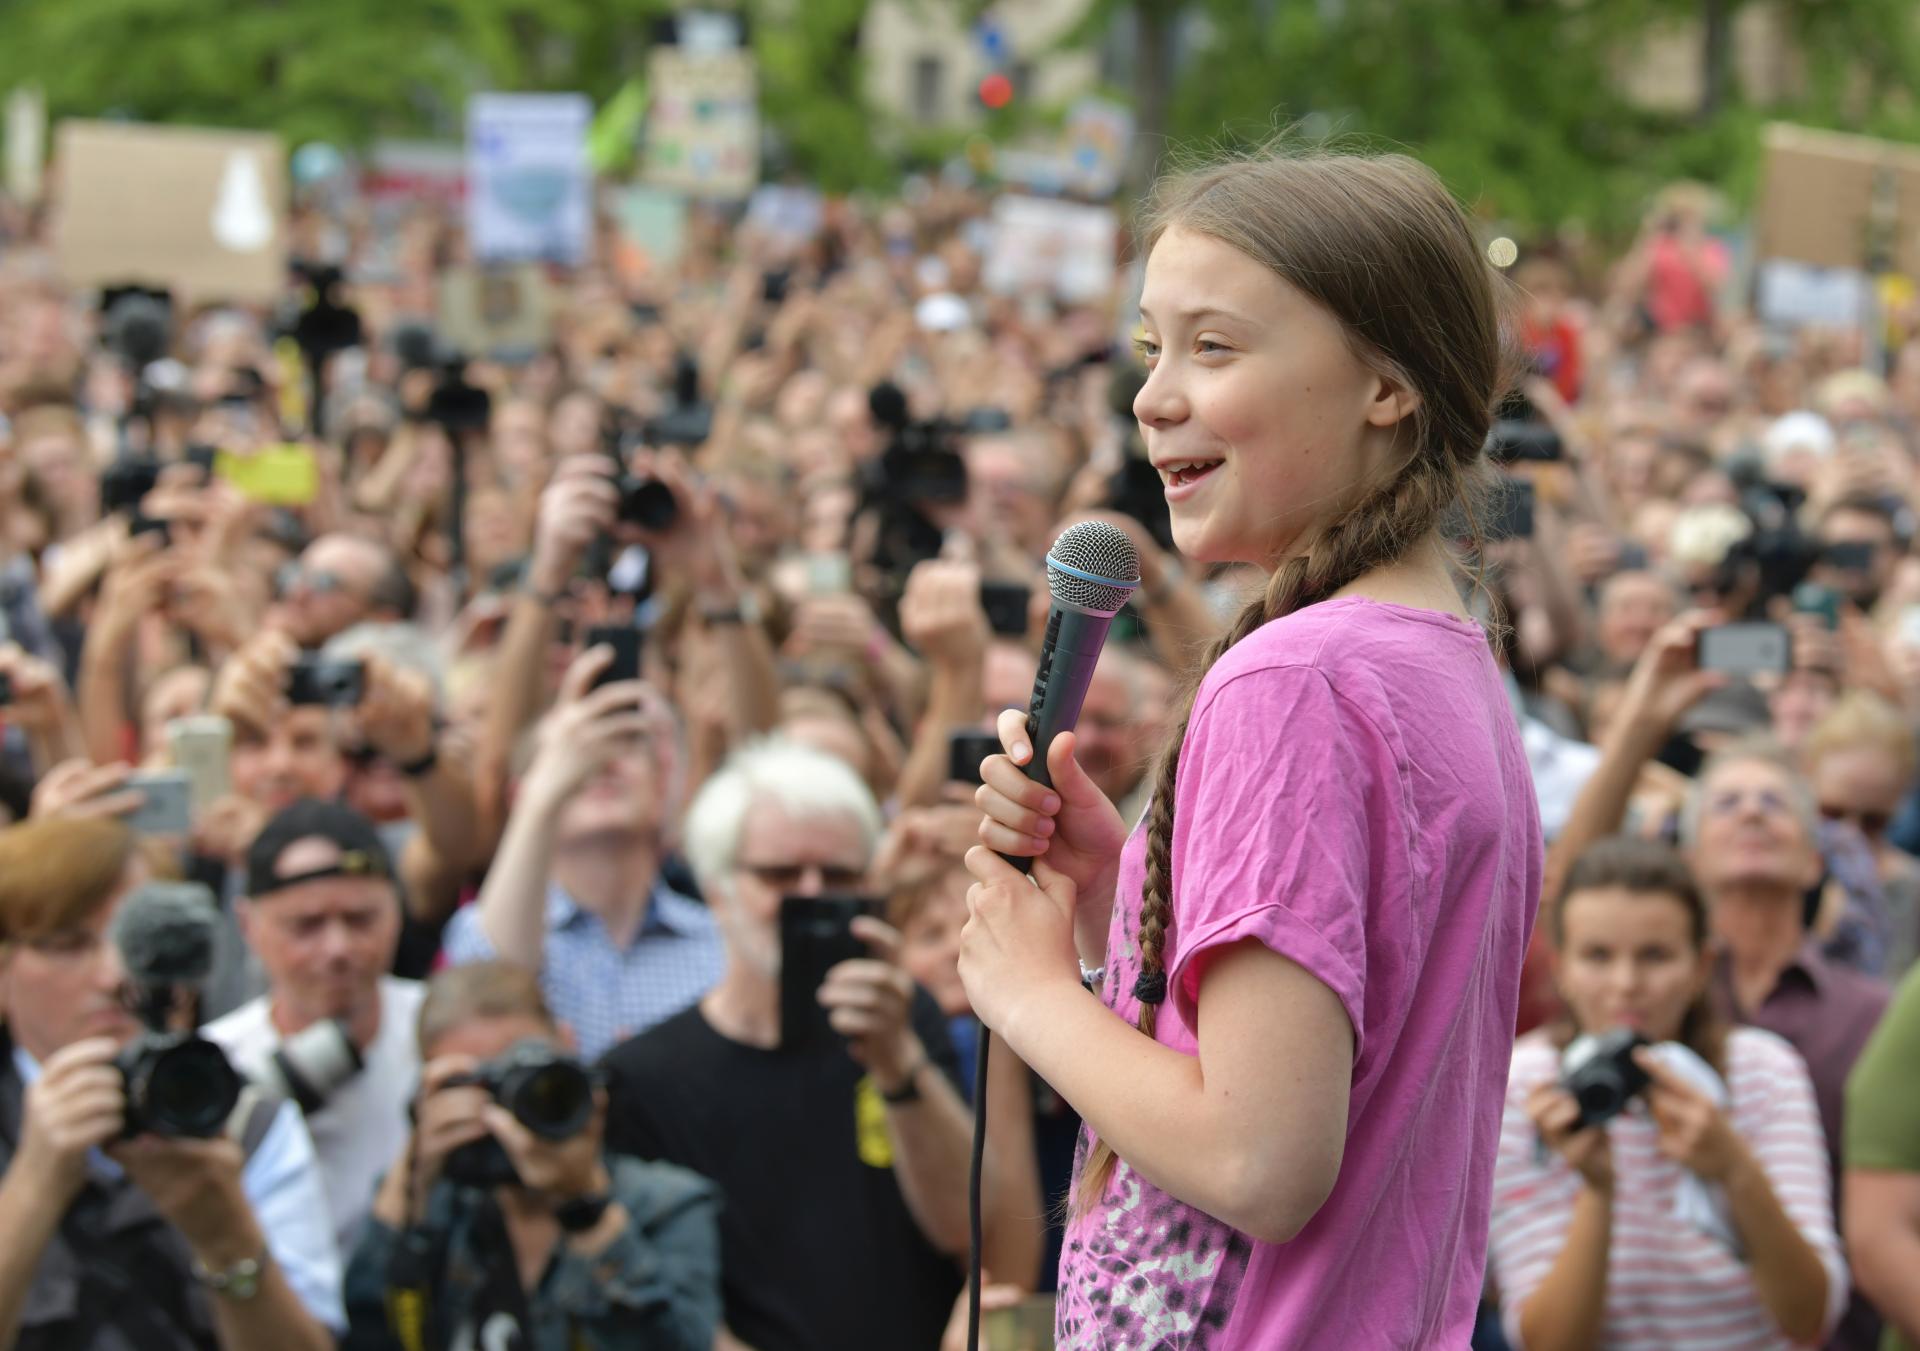 Teen climate activist Greta Thunberg mural in Canada vandalized